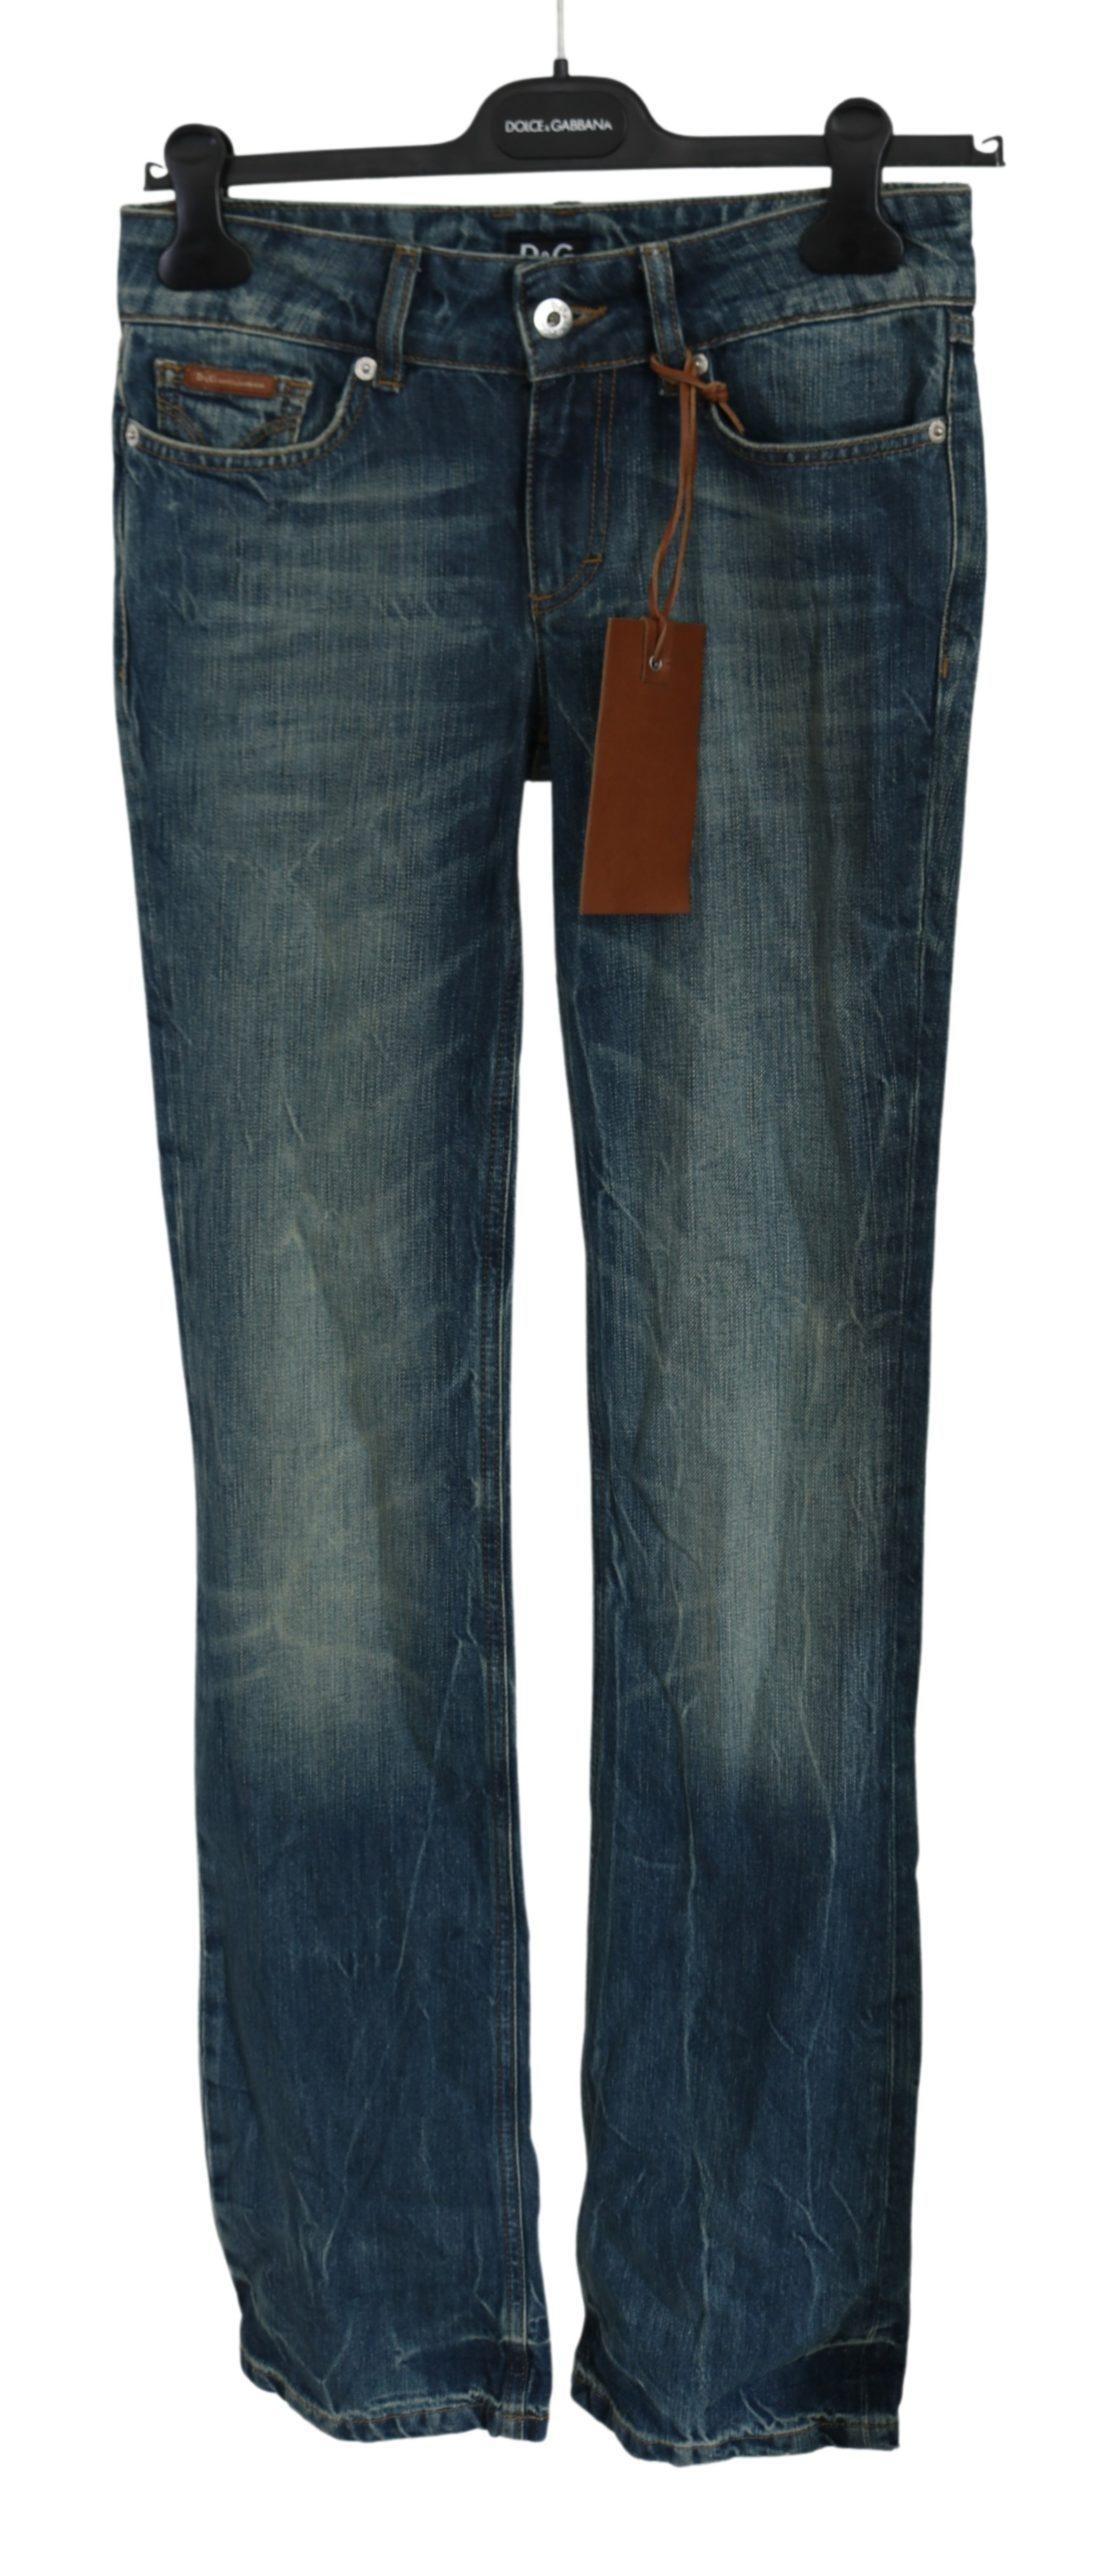 Dolce & Gabbana Women's Washed Low Waist Jeans PAN61021 - W24